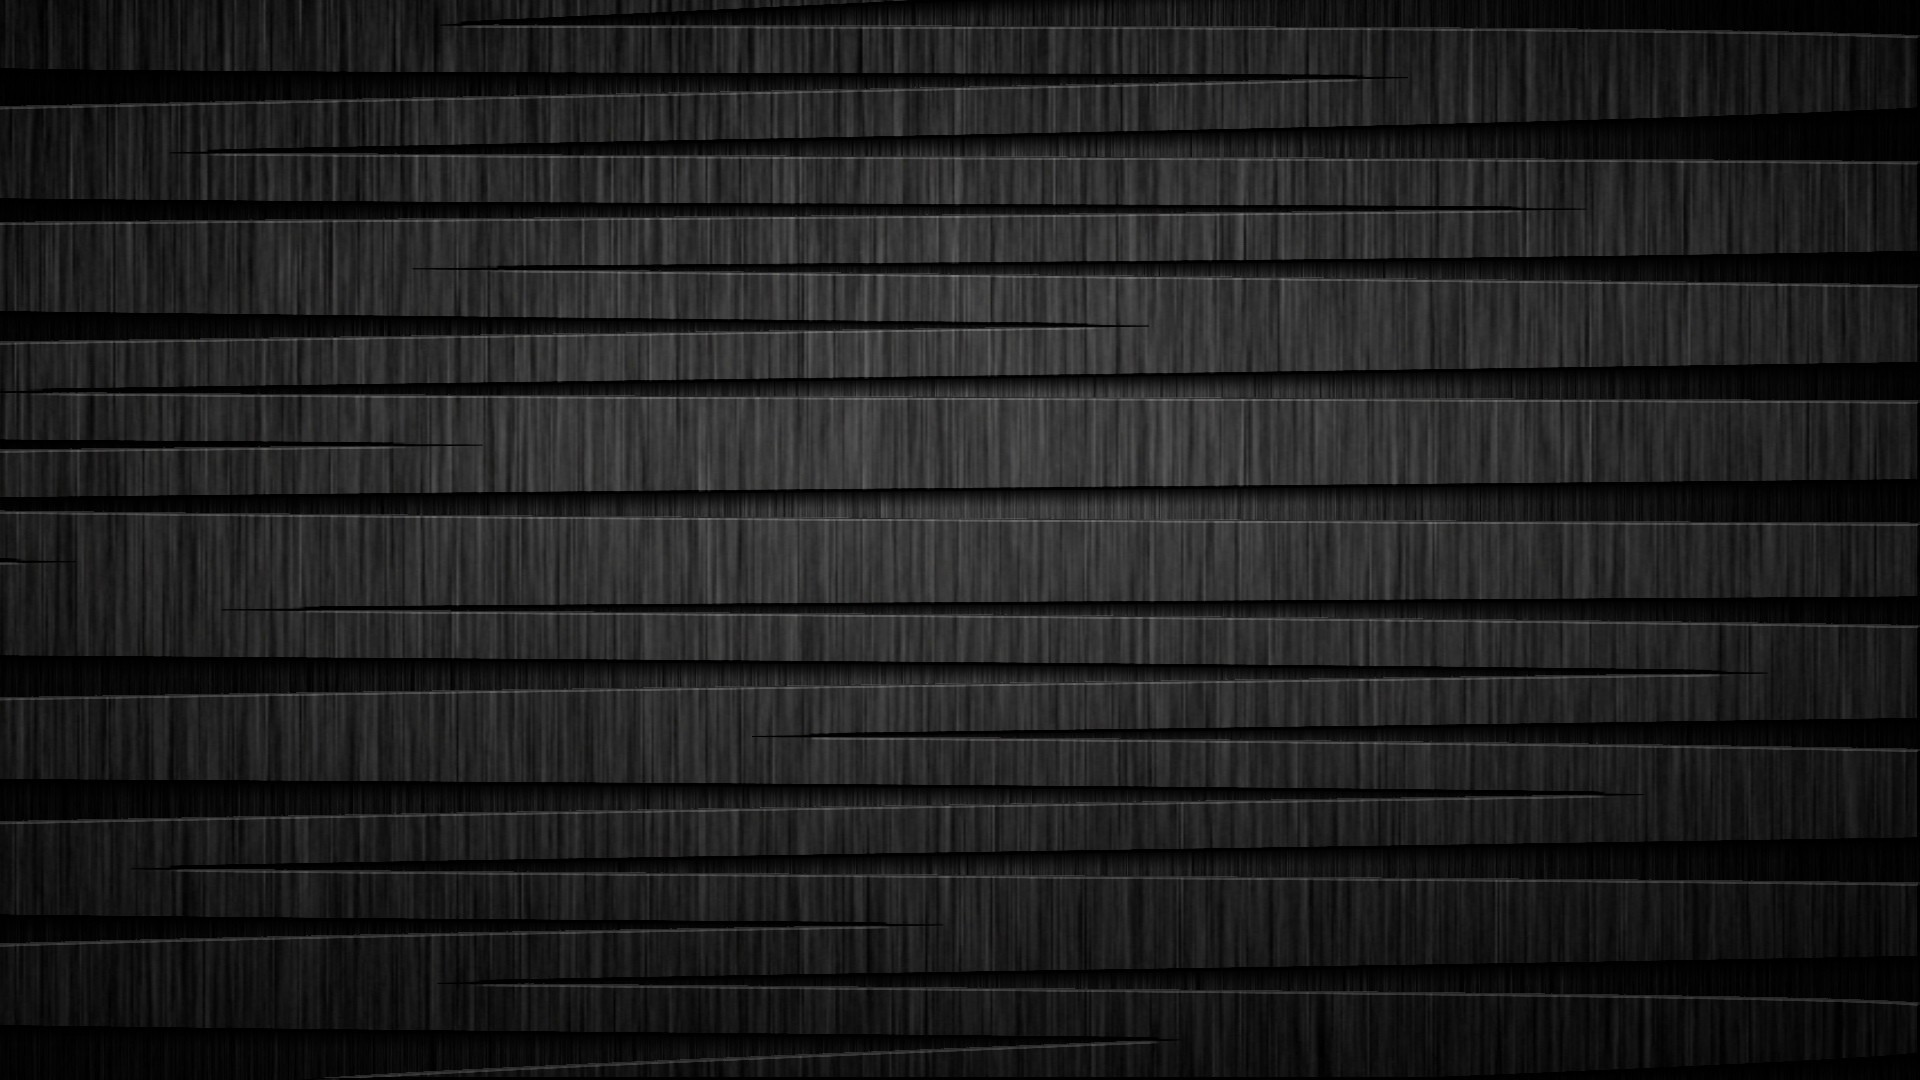 noir fond d 39 cran hd arri re plan 1920x1080 id 207828 wallpaper abyss. Black Bedroom Furniture Sets. Home Design Ideas